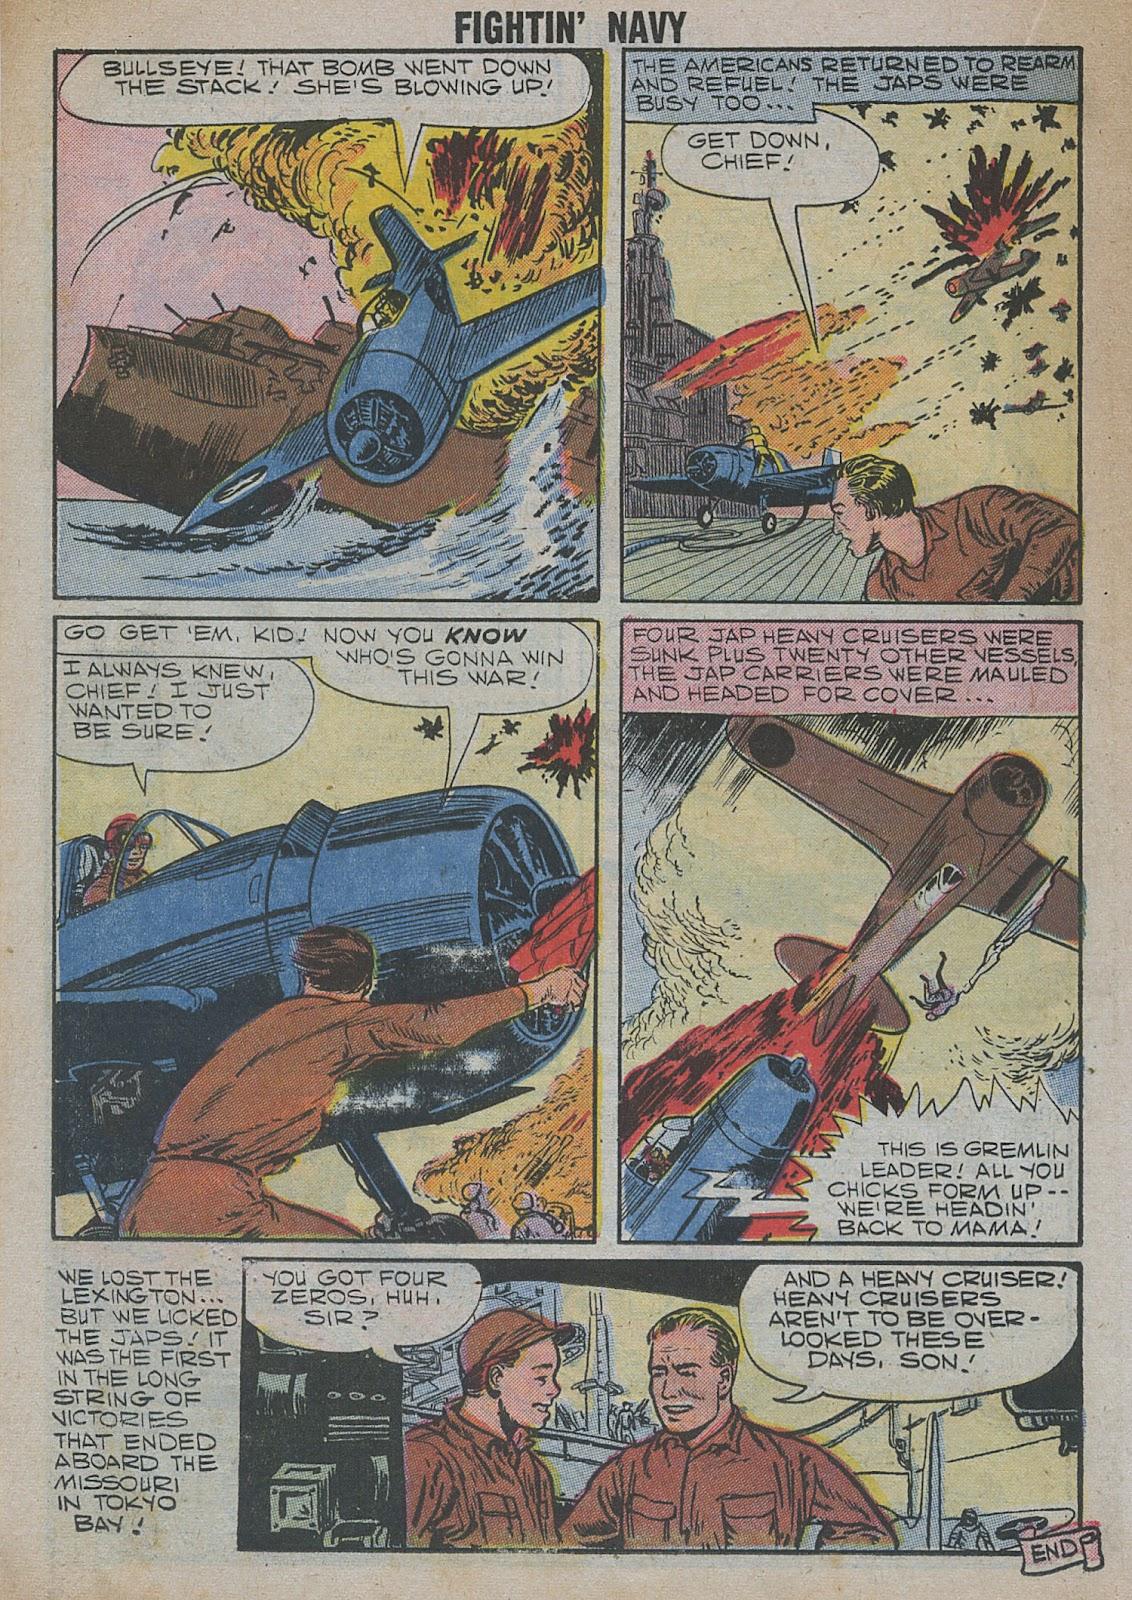 Read online Fightin' Navy comic -  Issue #82 - 42